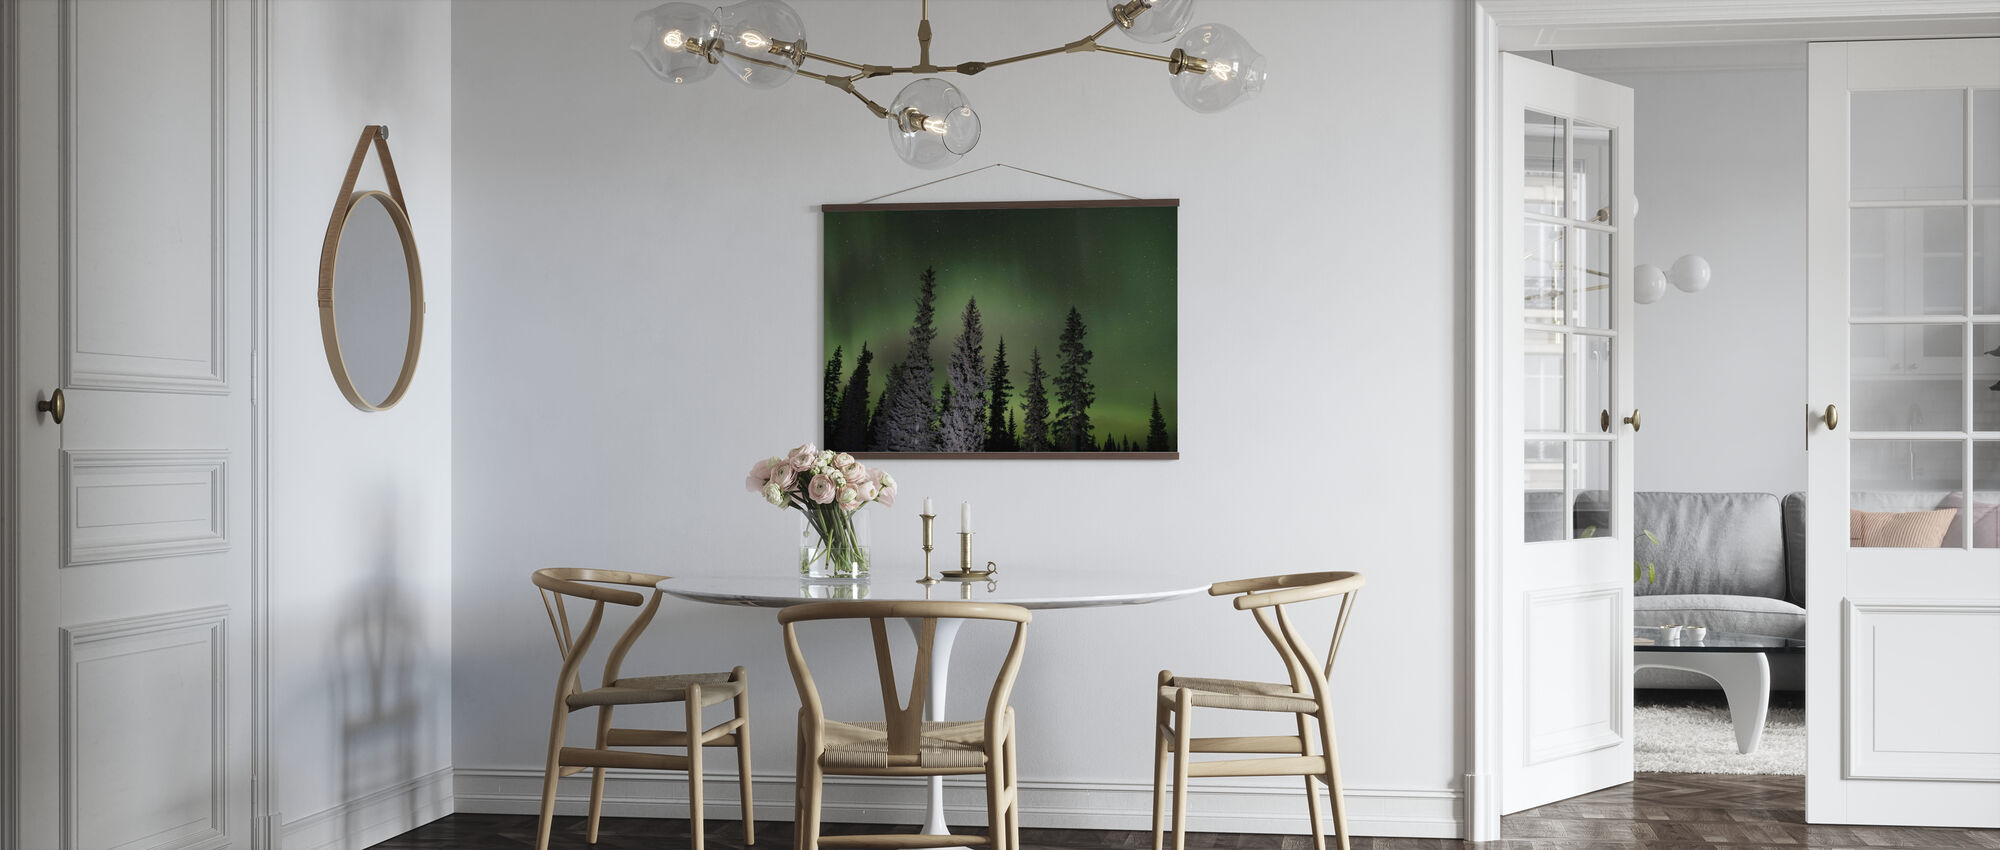 Aurora - Juliste - Keittiö